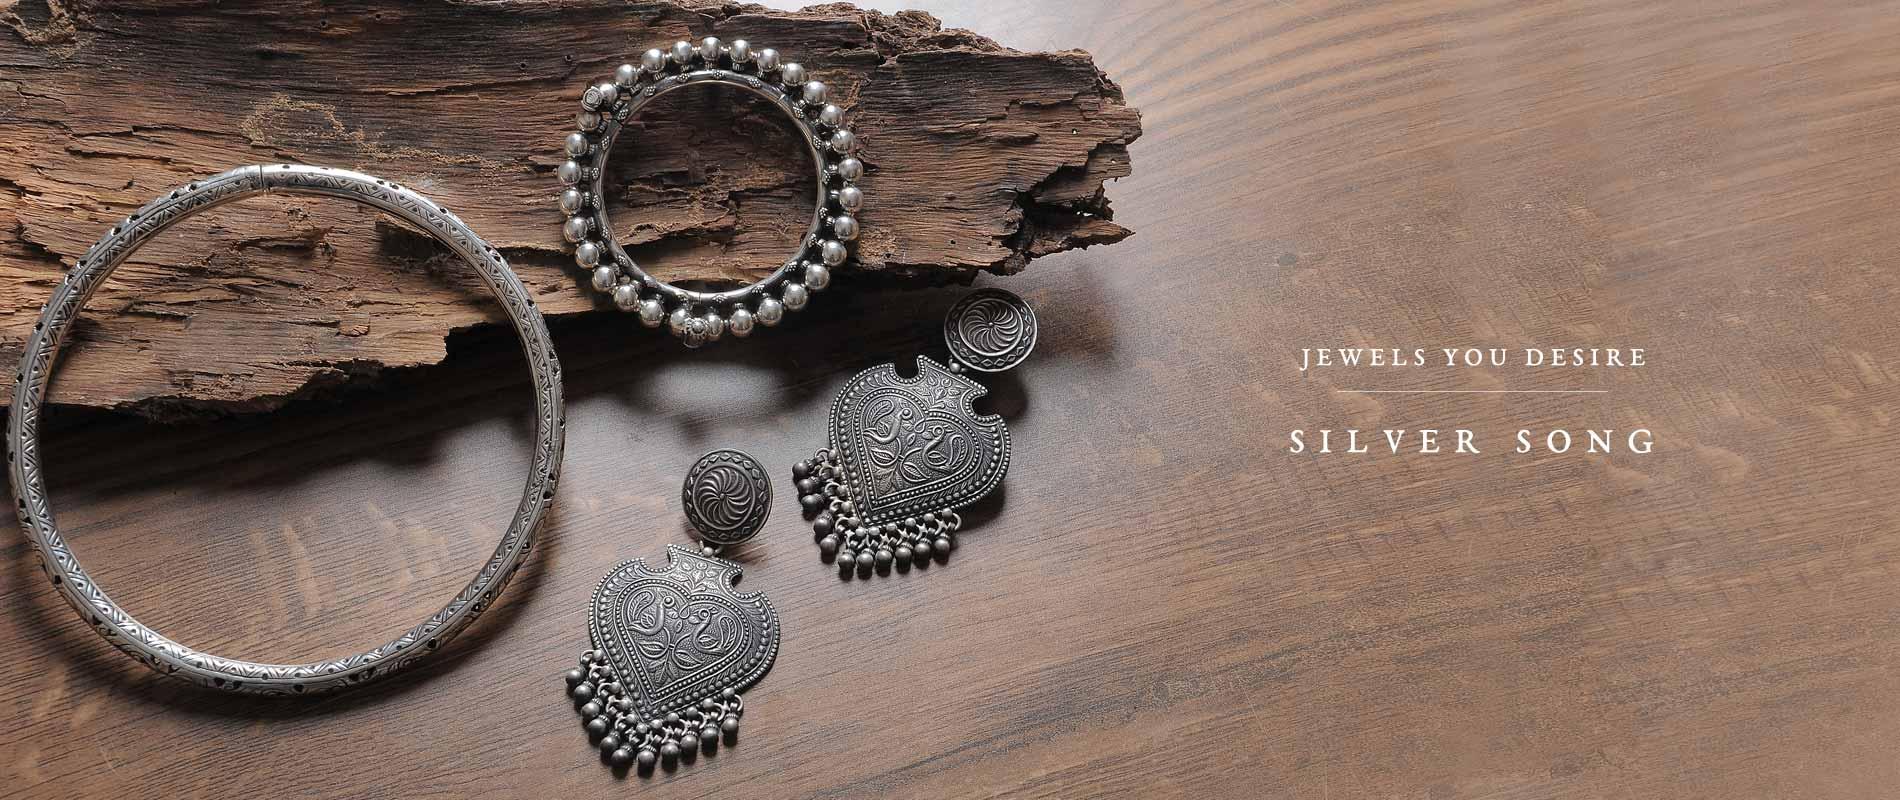 171104NHJ069_NHJ_Naresh_Handicrafts_8027